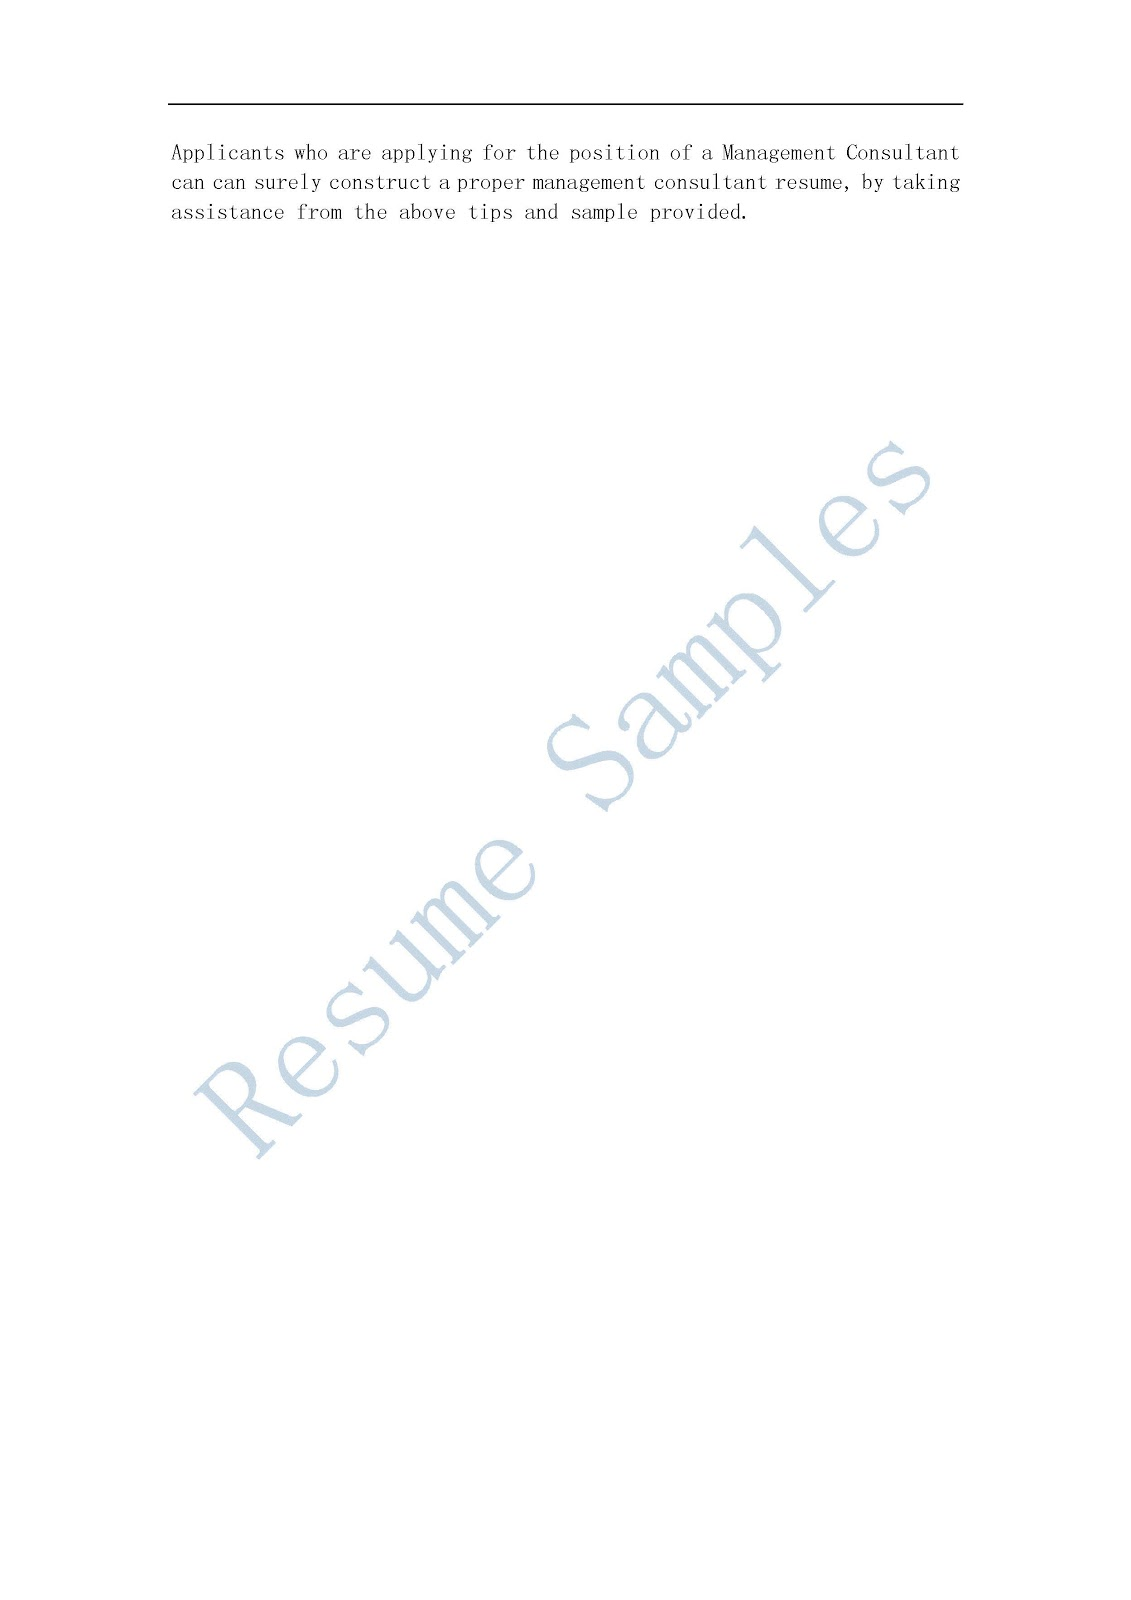 resume samples management consultant resume